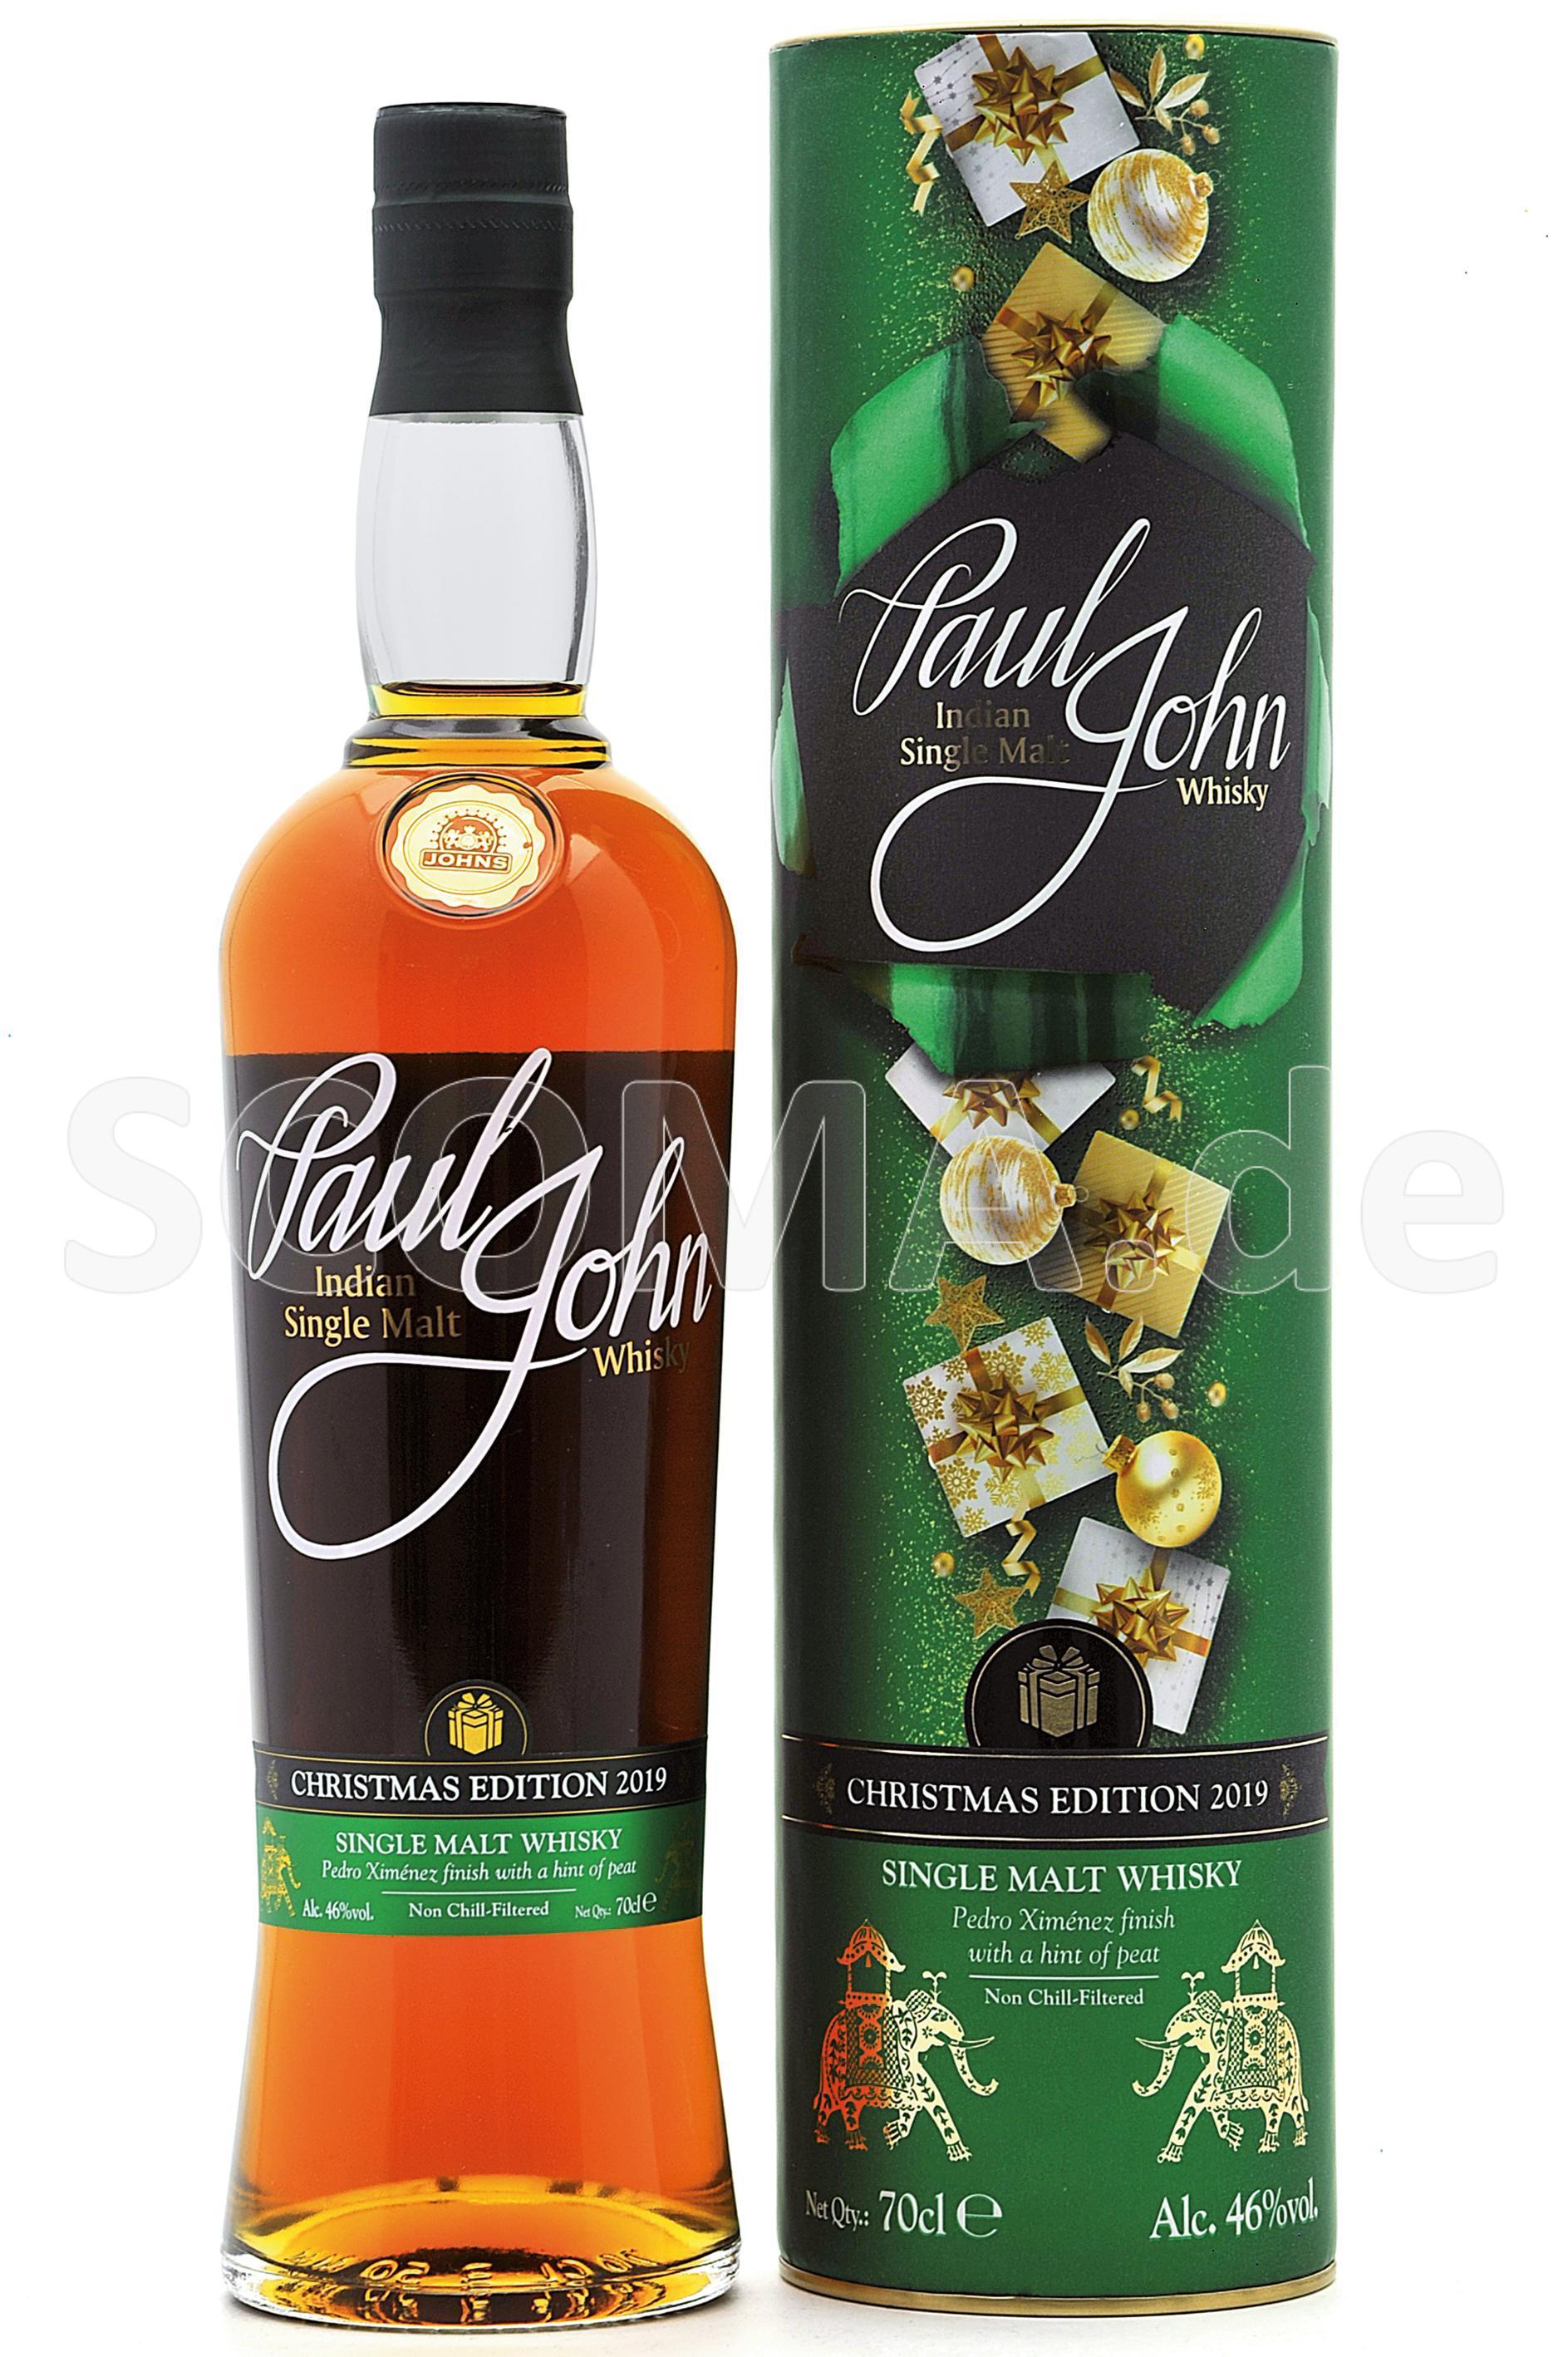 Paul John Christmas Edition 20...